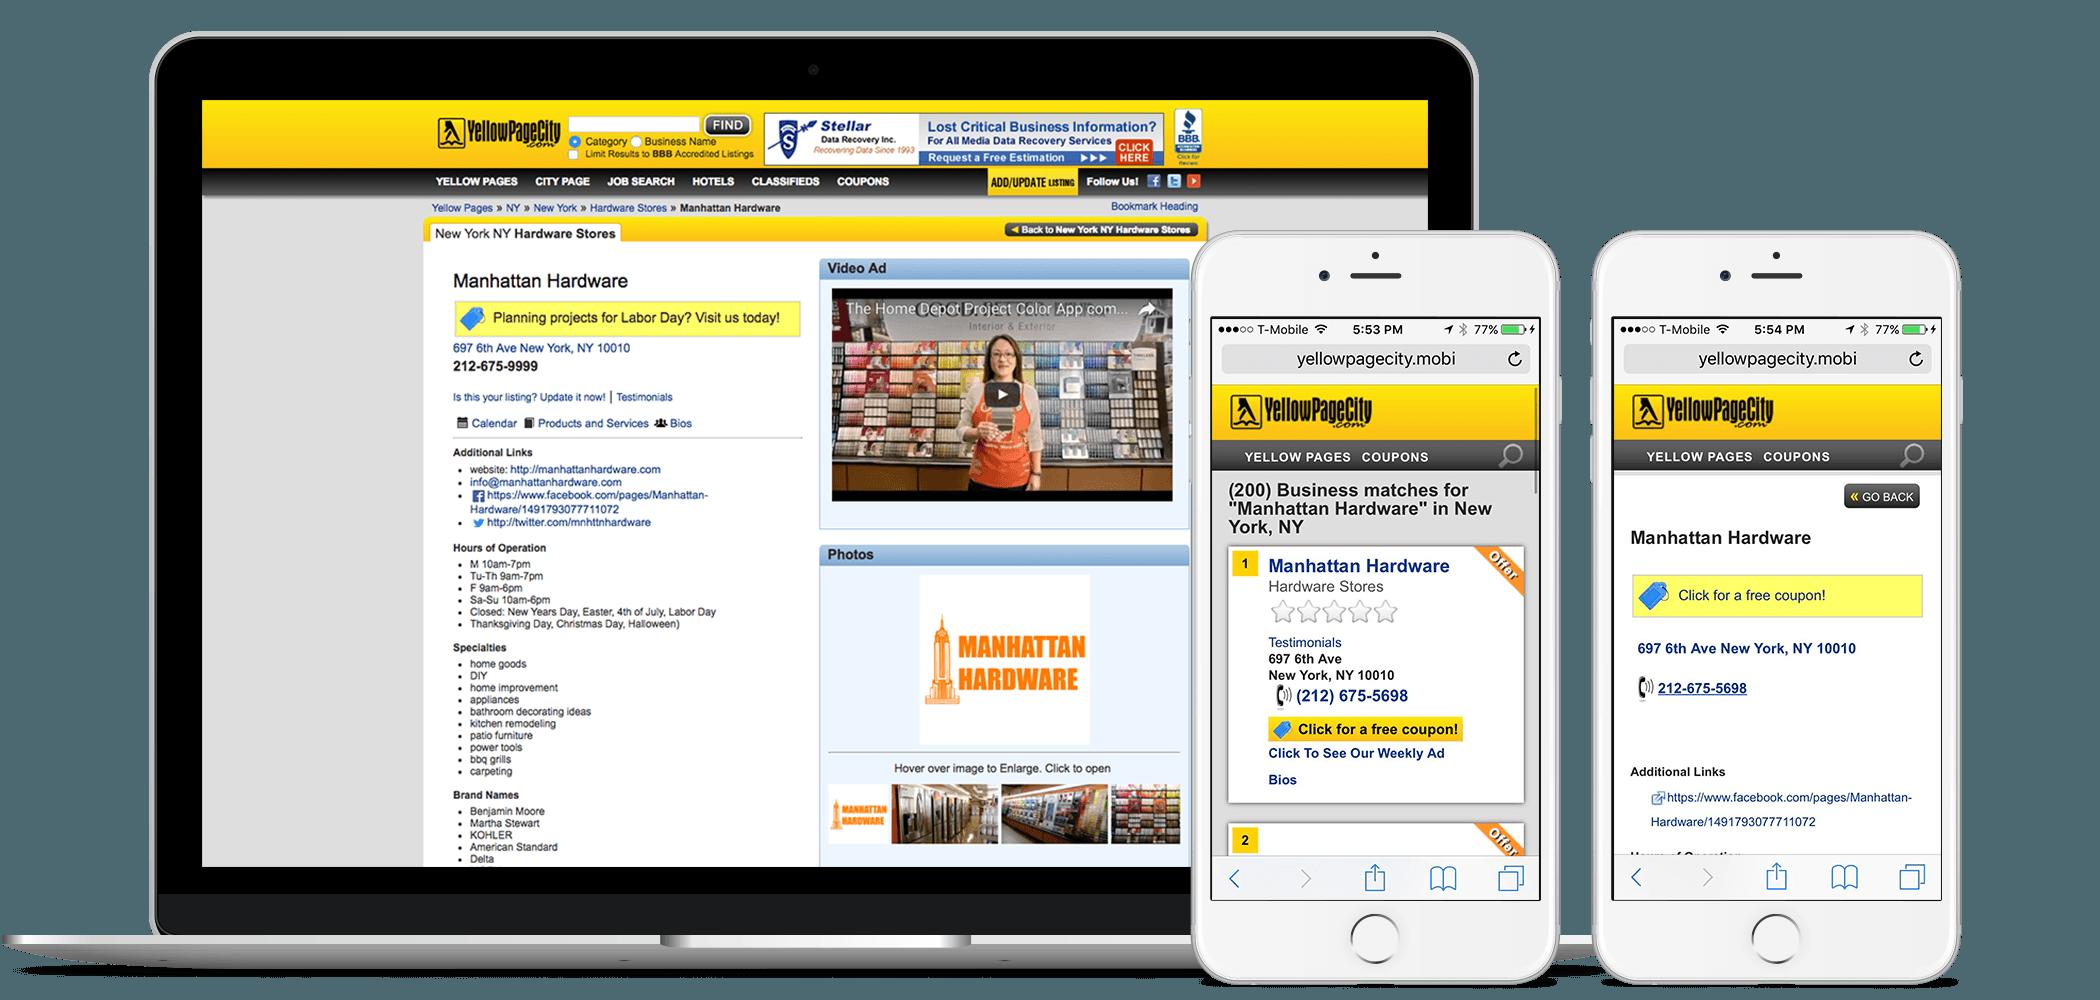 YellowPageCity com | Update Your YellowPageCity Business